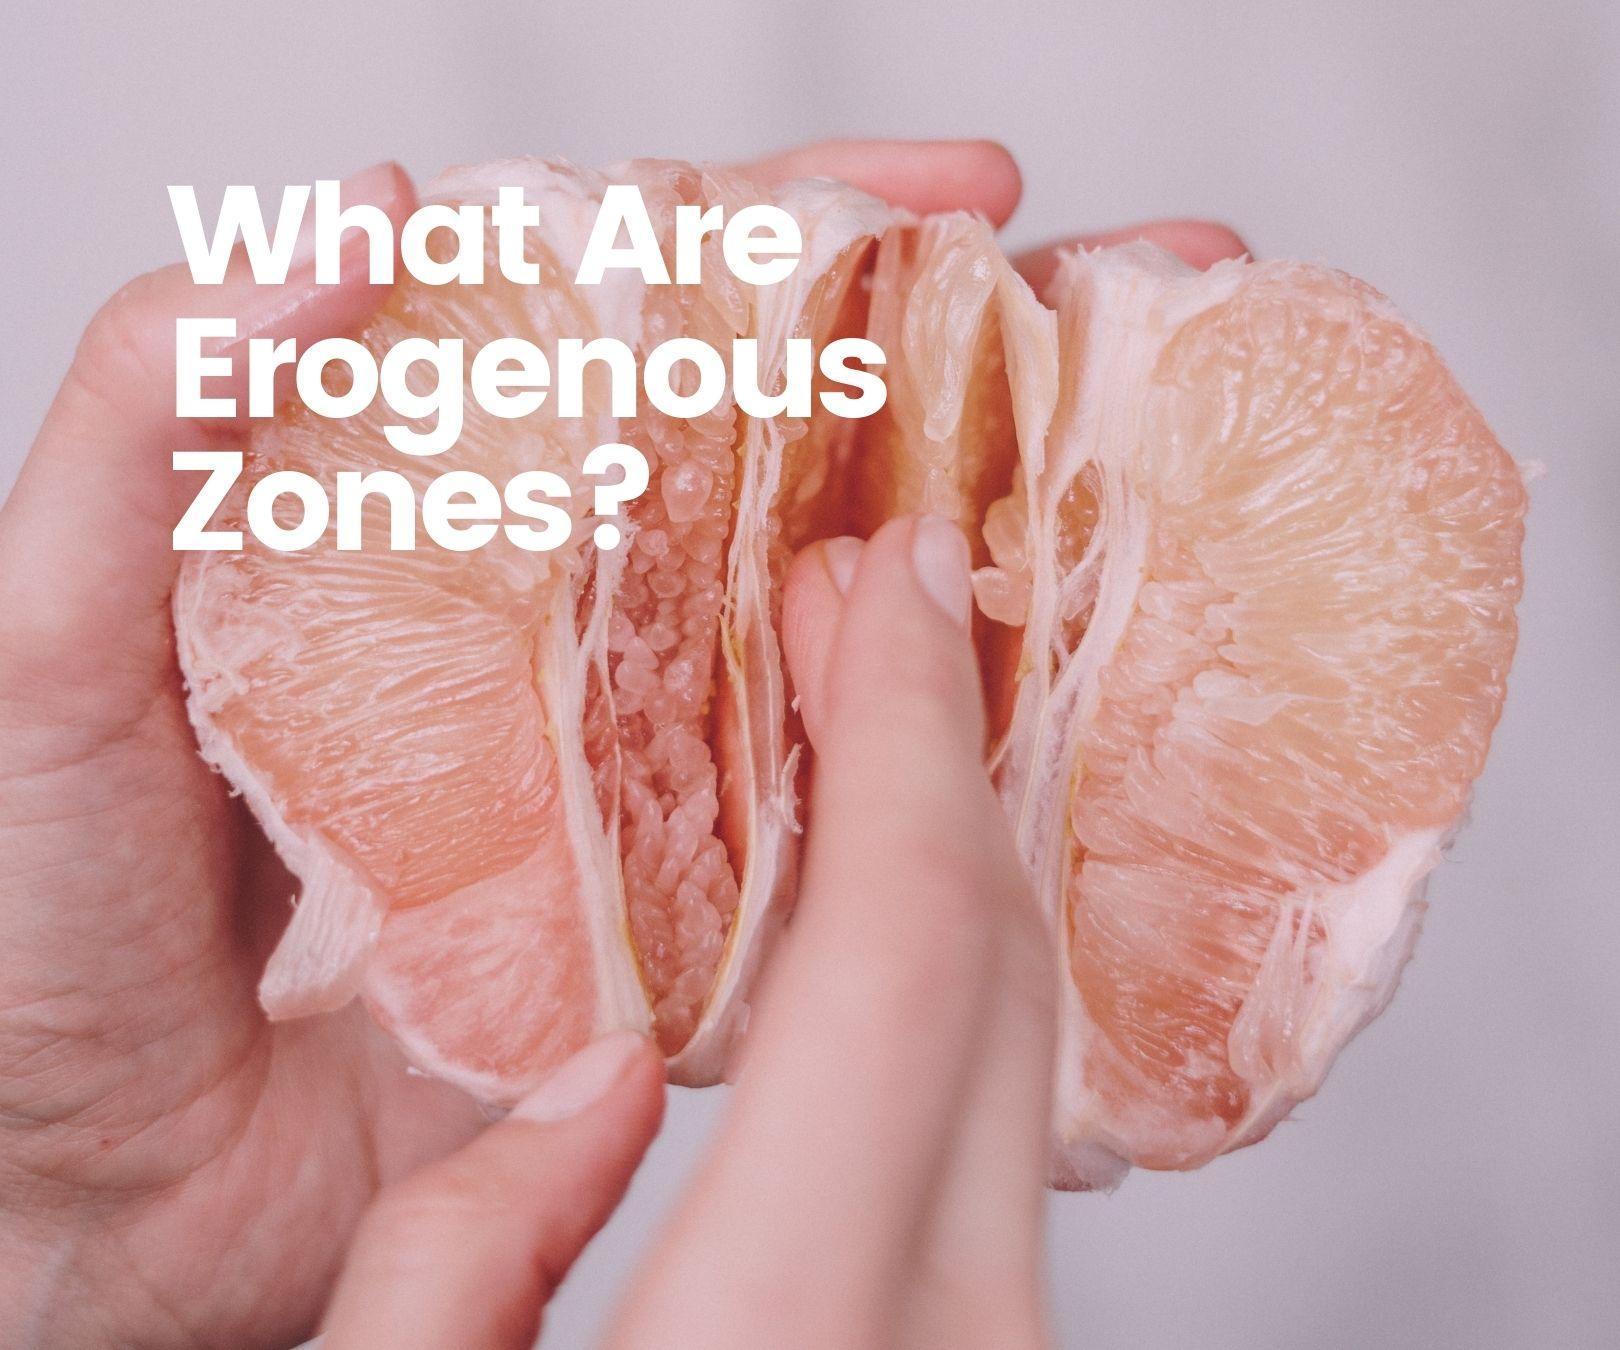 What Are Erogenous Zones?